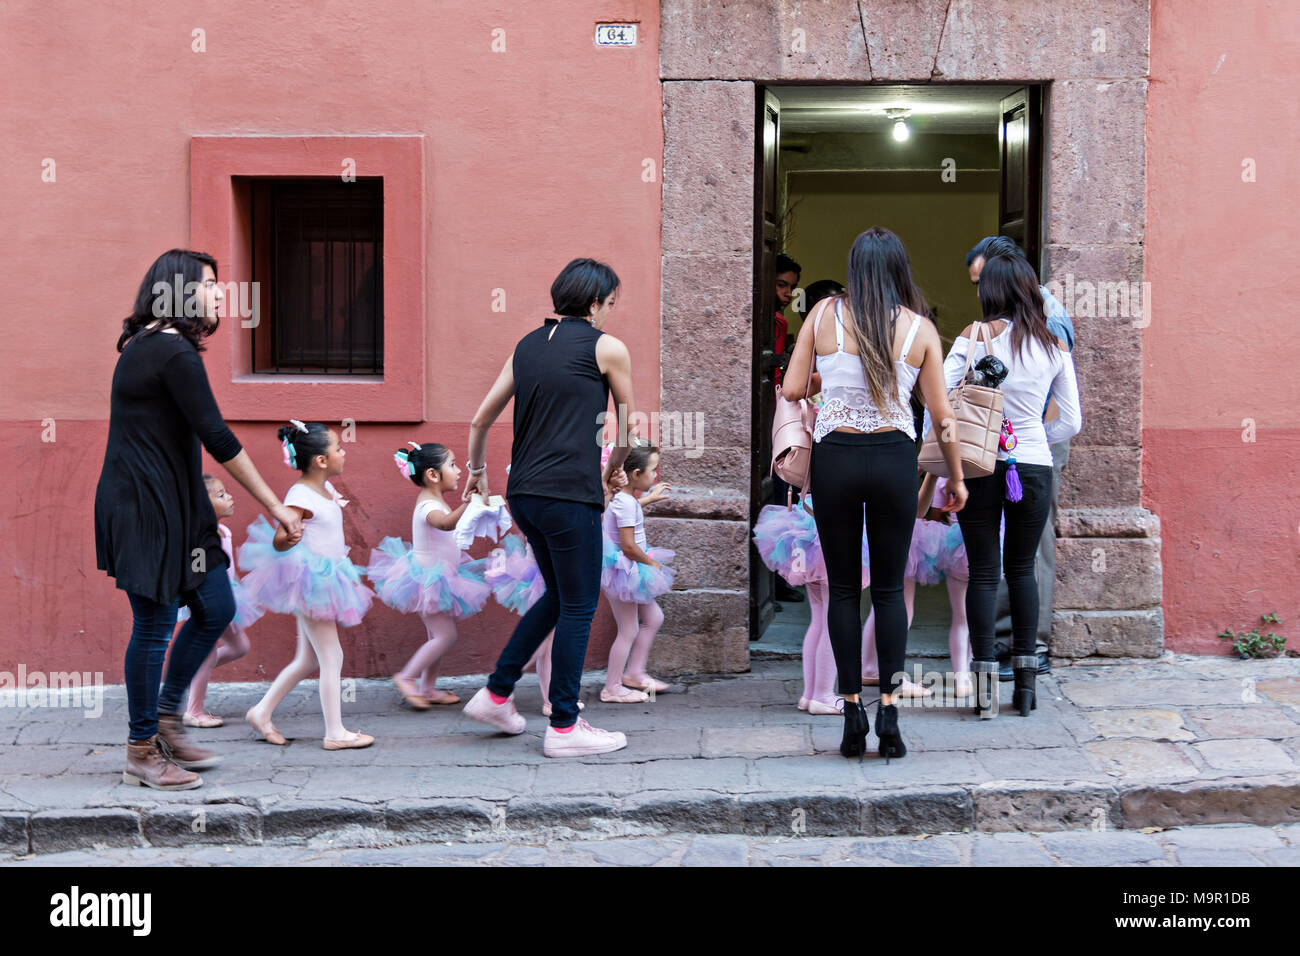 Joven Mexicano Niñas Vestidas De Tutus Son Acompañados Por